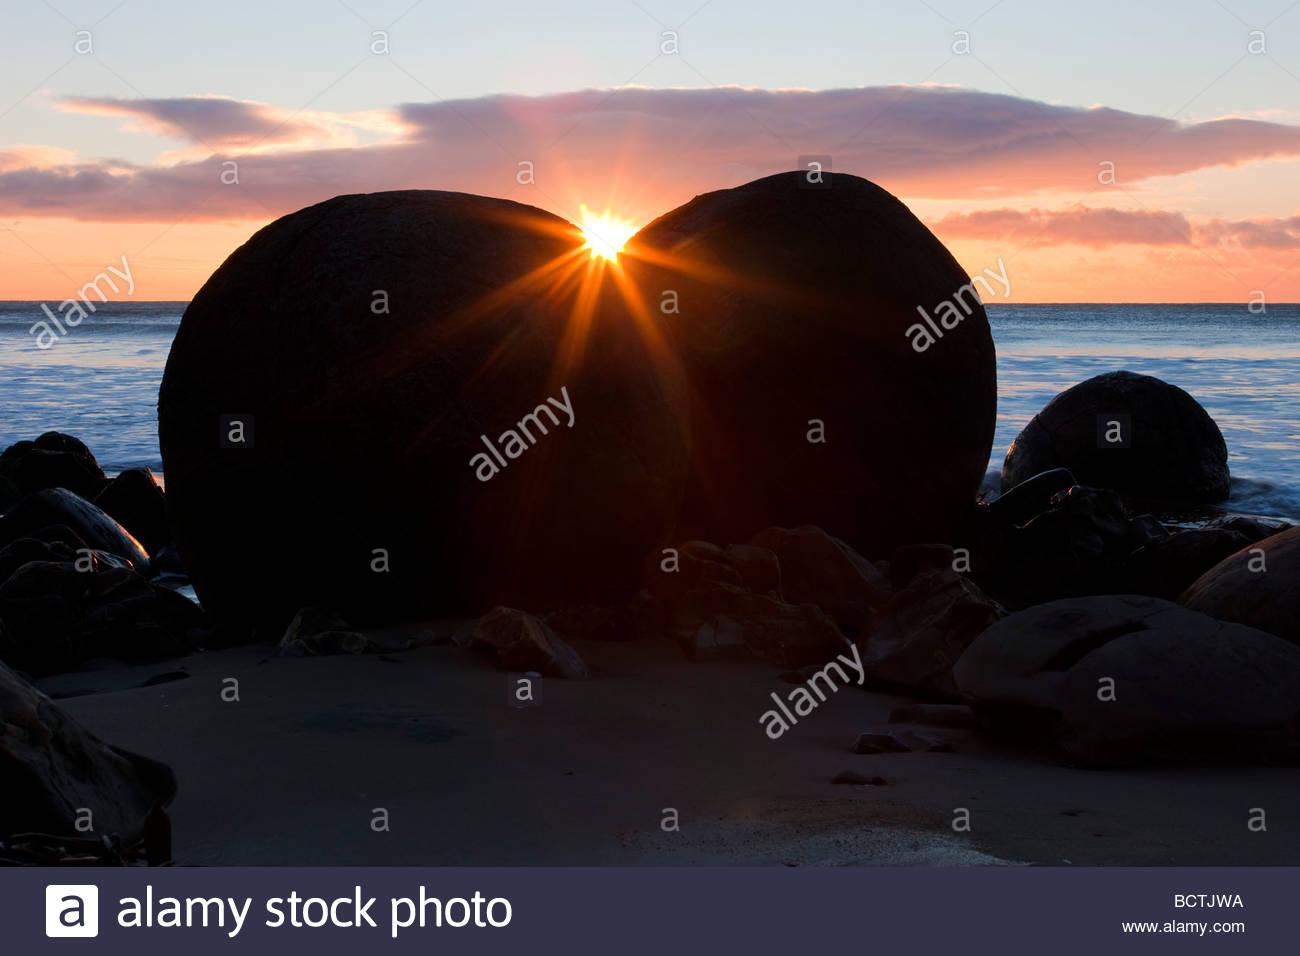 The rising sun shines between two of the Moeraki Boulders located at Koekohe Beach along Otago coast of New Zealand. - Stock Image